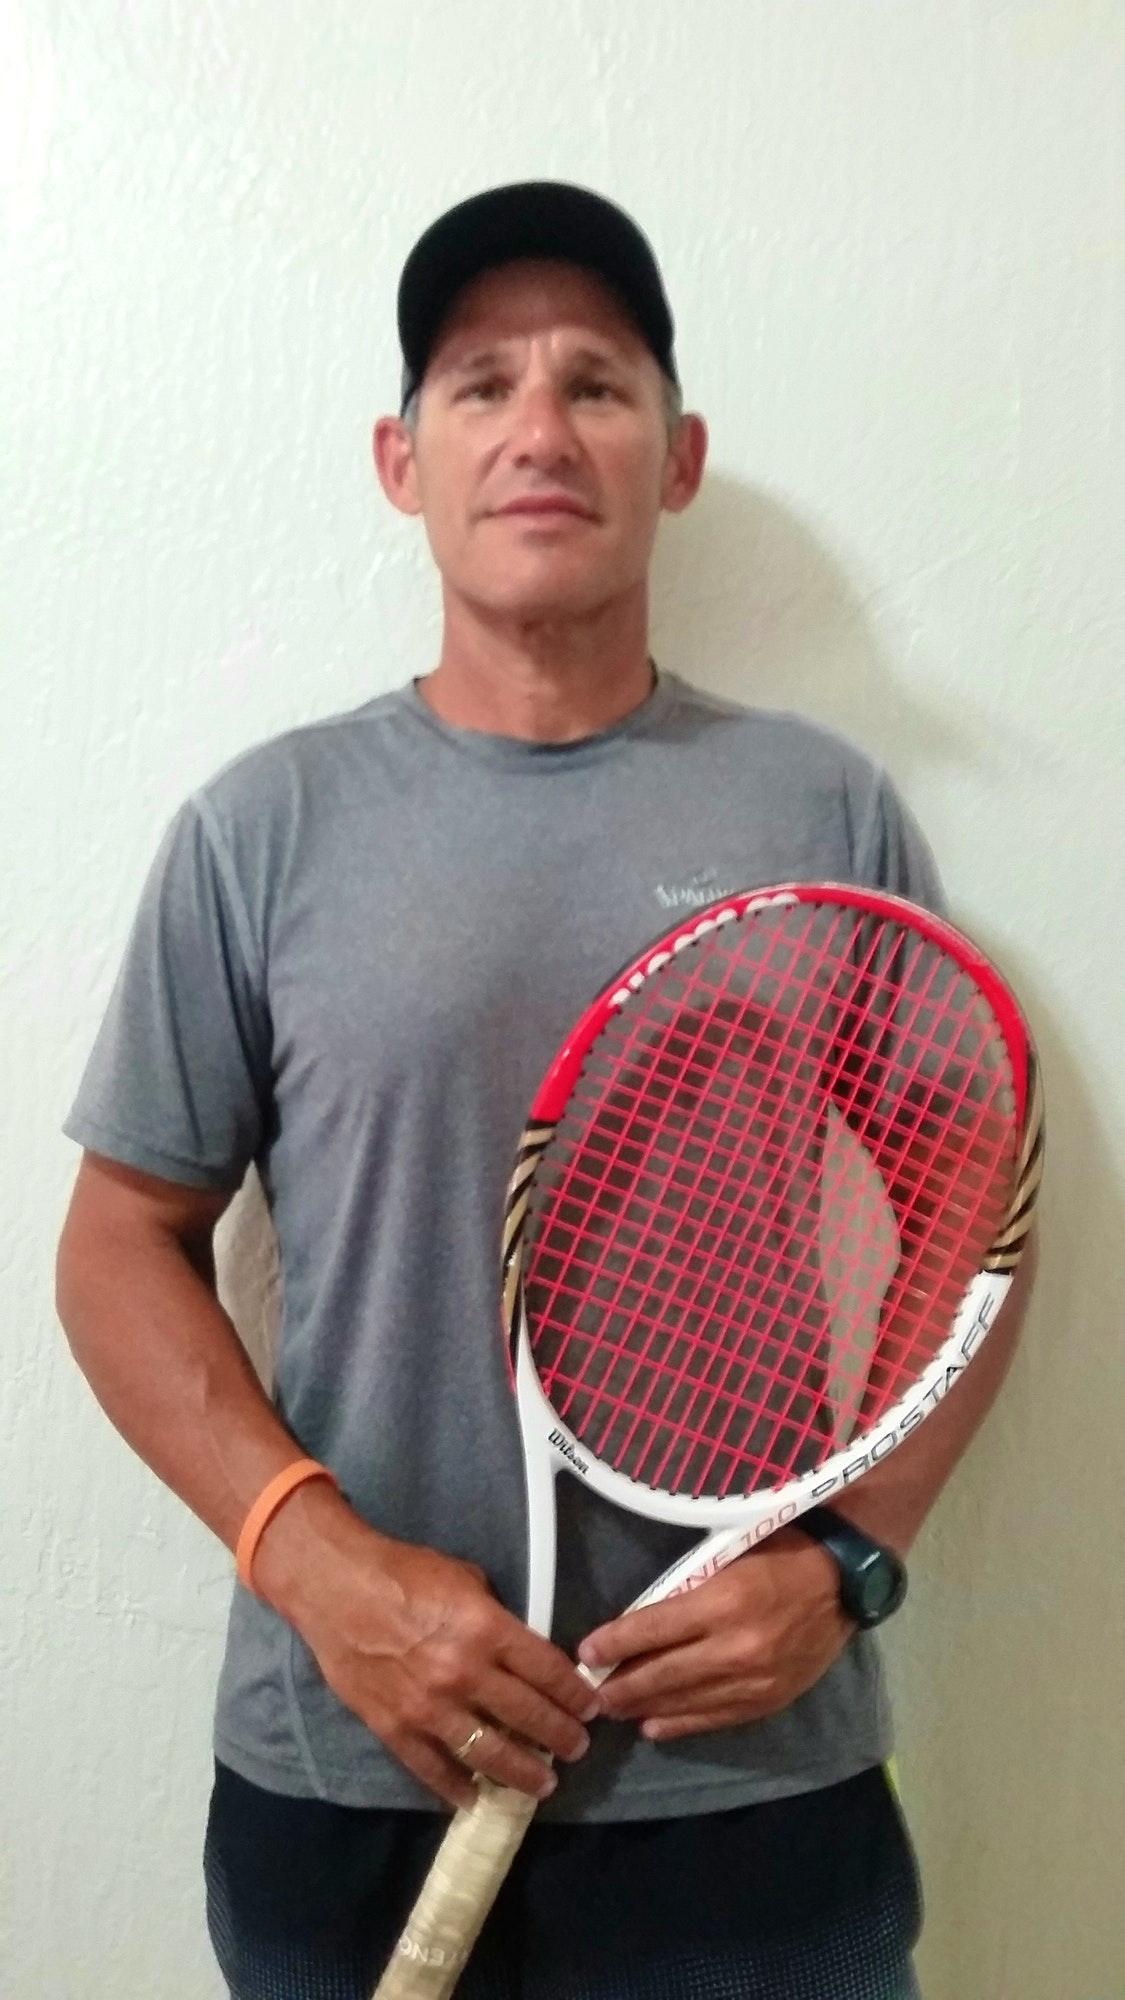 Gustavo T. teaches tennis lessons in Miami, FL